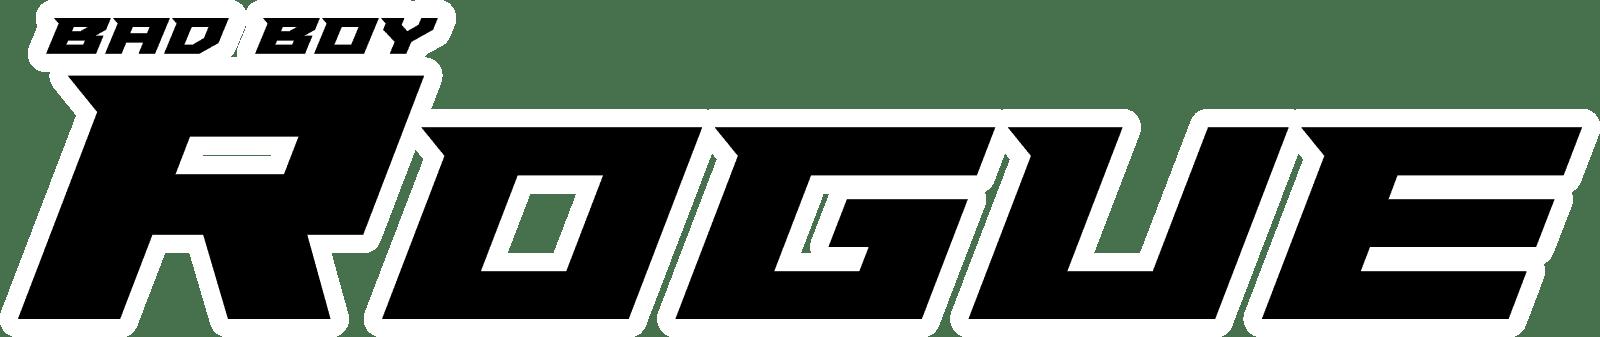 BBM-Rogue_Logo